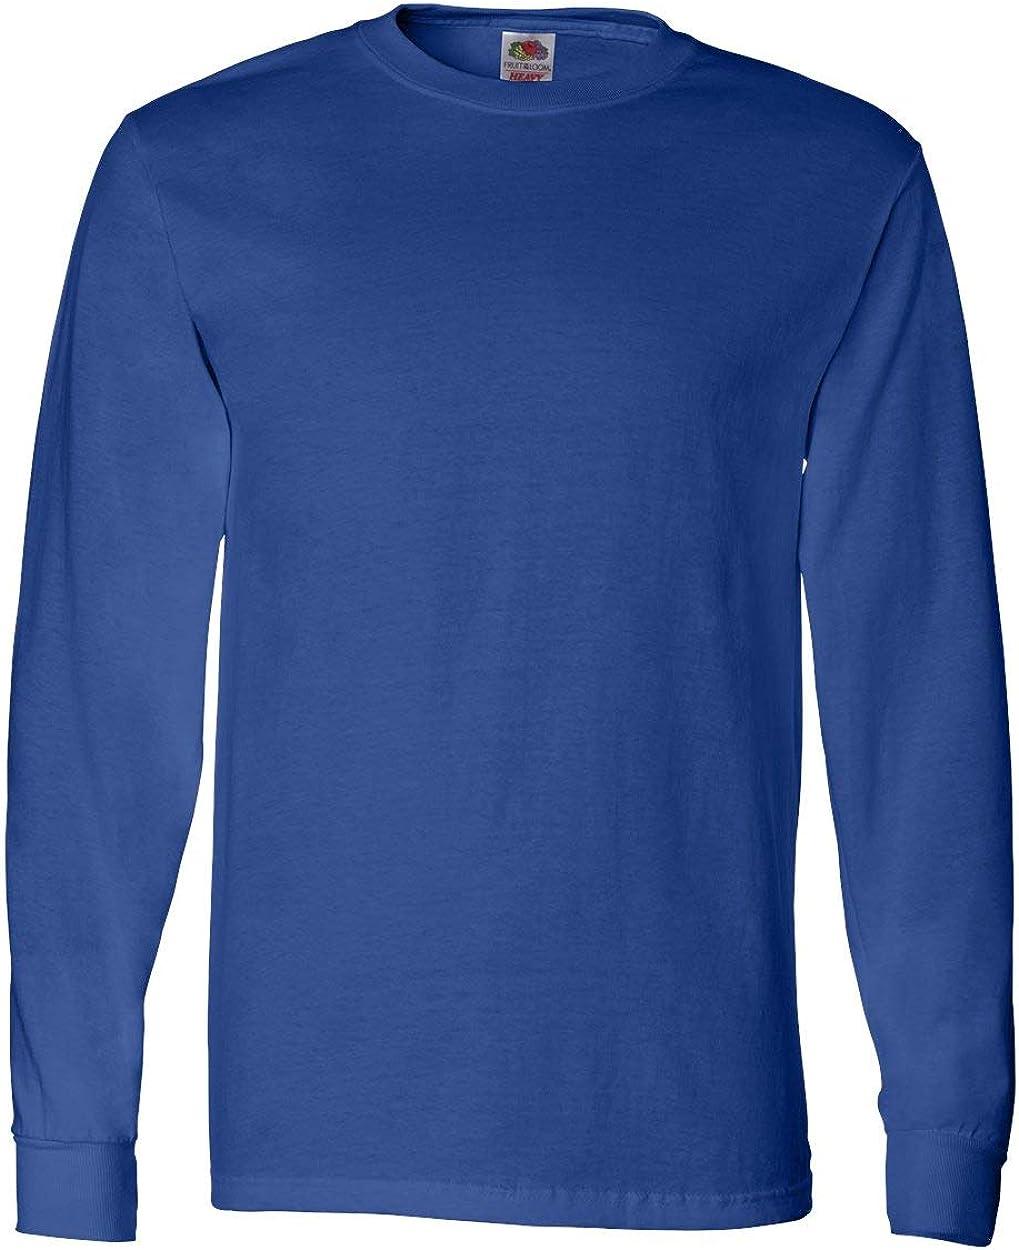 Fruit of the Loom Men's Long Sleeve Cotton T-Shirt